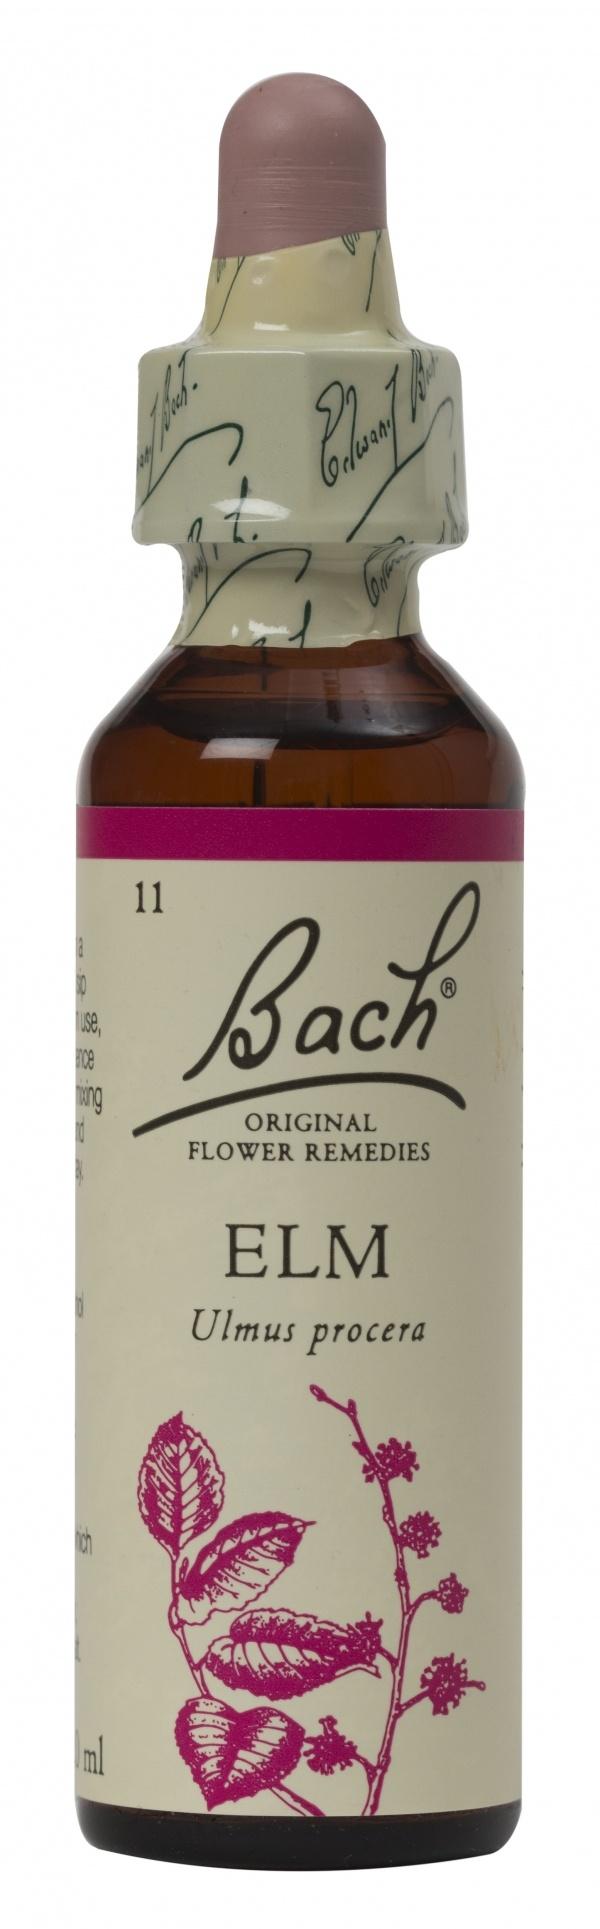 Bach Flower Remedy Elm 20ml